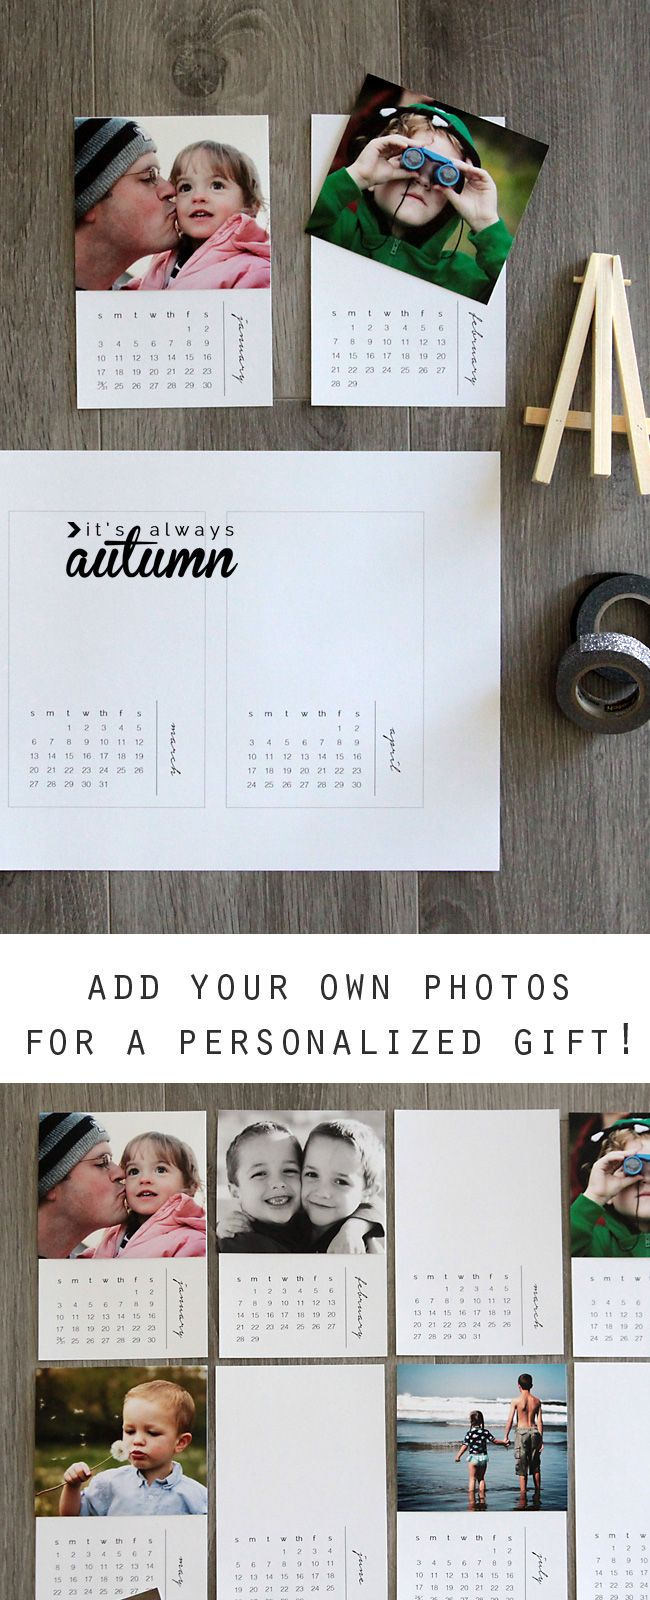 Calendar Ideas For Grandparents : Free printable mini diy photo calendar great gift